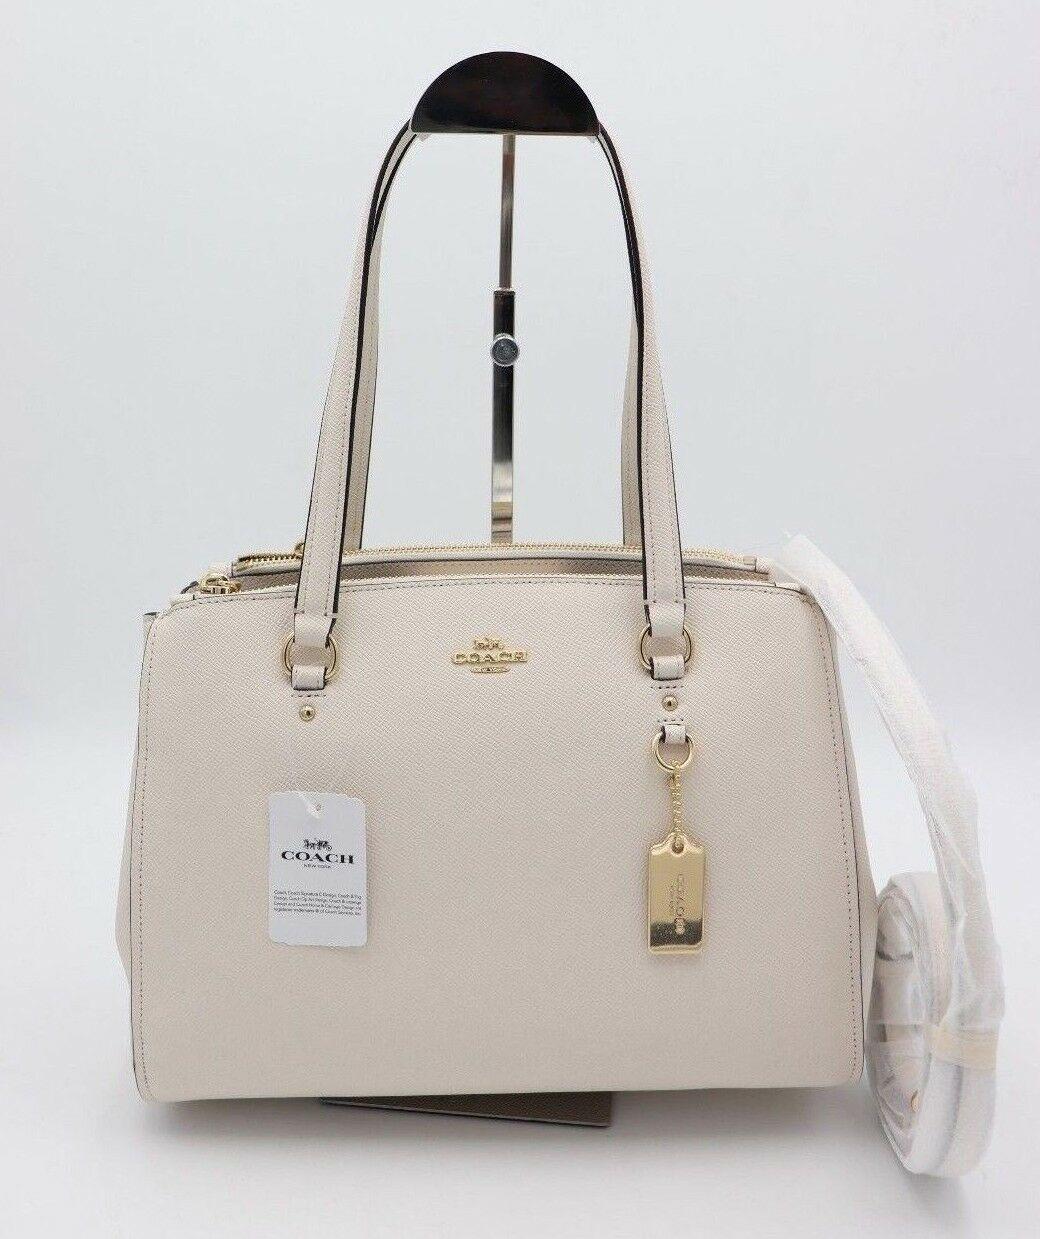 NWT Coach Stanton 29 White Chalk Carryall Satchel Shoulder Bag Purse 37147 New